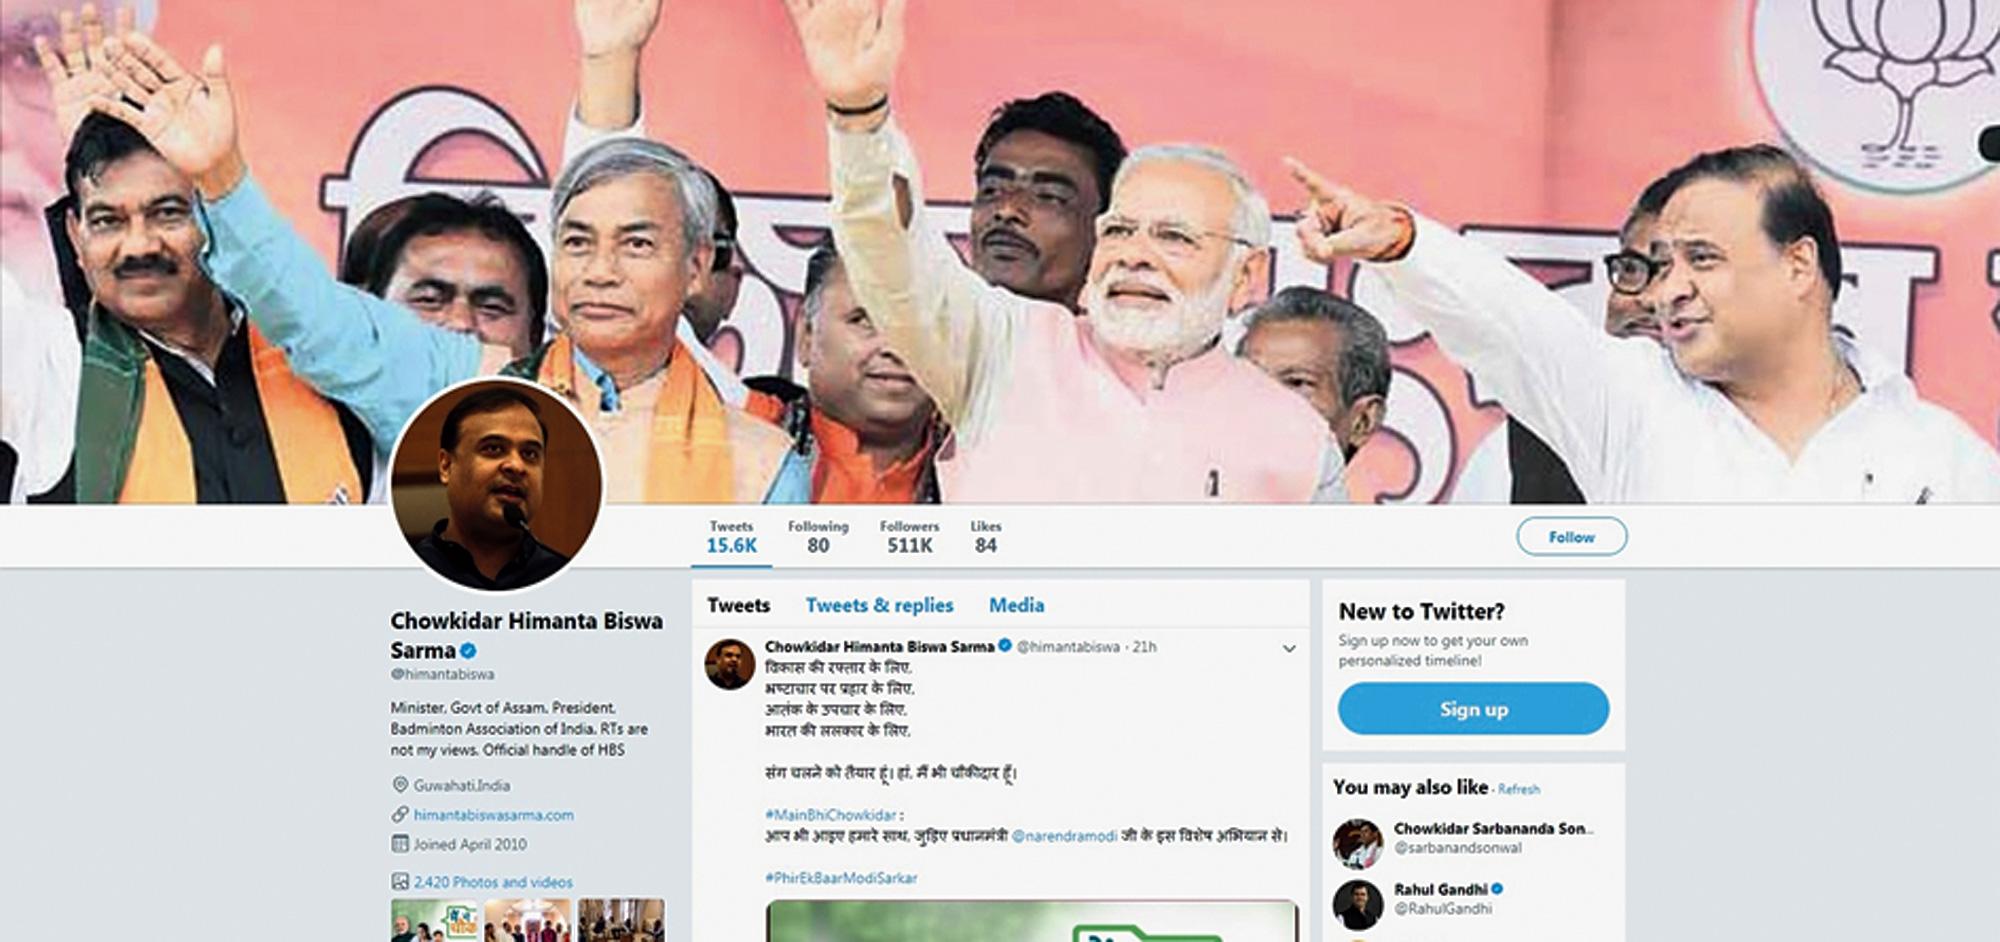 The Twitter page of Himanta Biswa Sarma